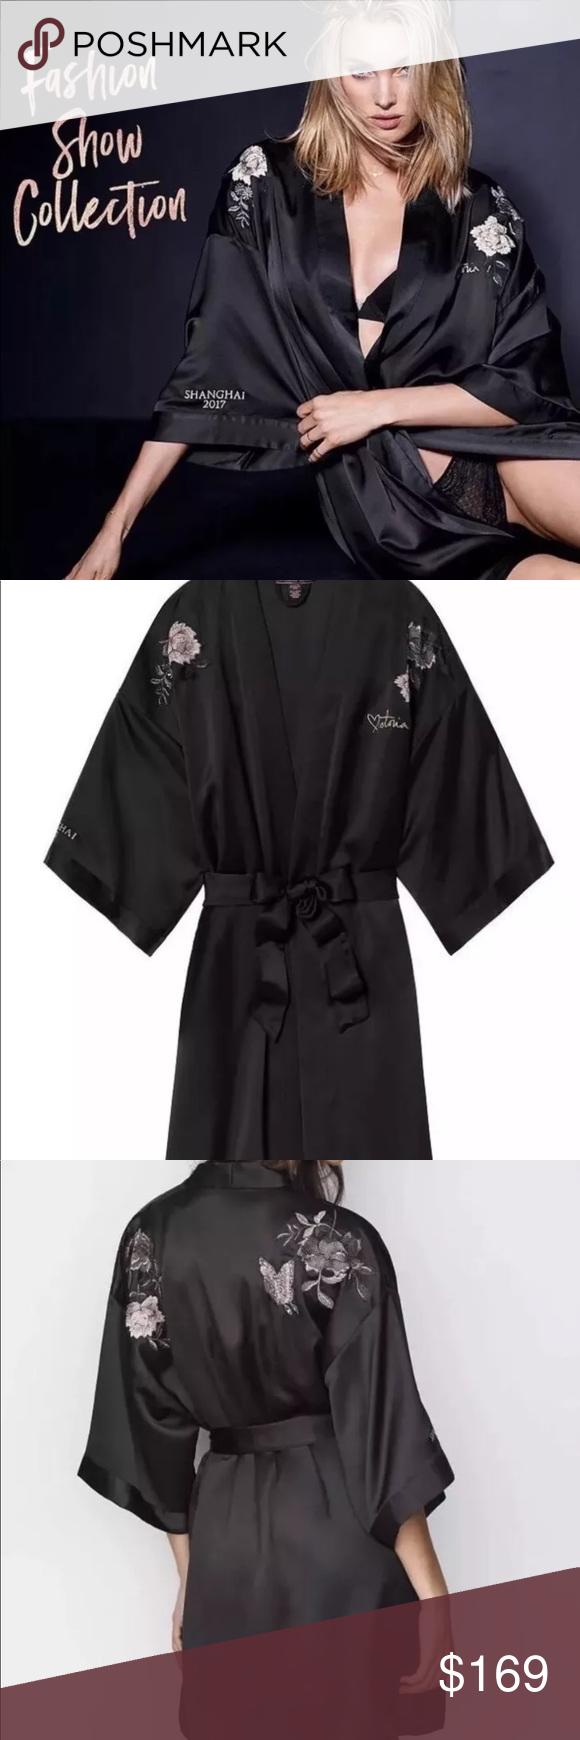 673fb1cfa9 Victoria s secret 2017 Shanghai fashion show robe Brand new with tag Size  M L Victoria s Secret Intimates   Sleepwear Robes